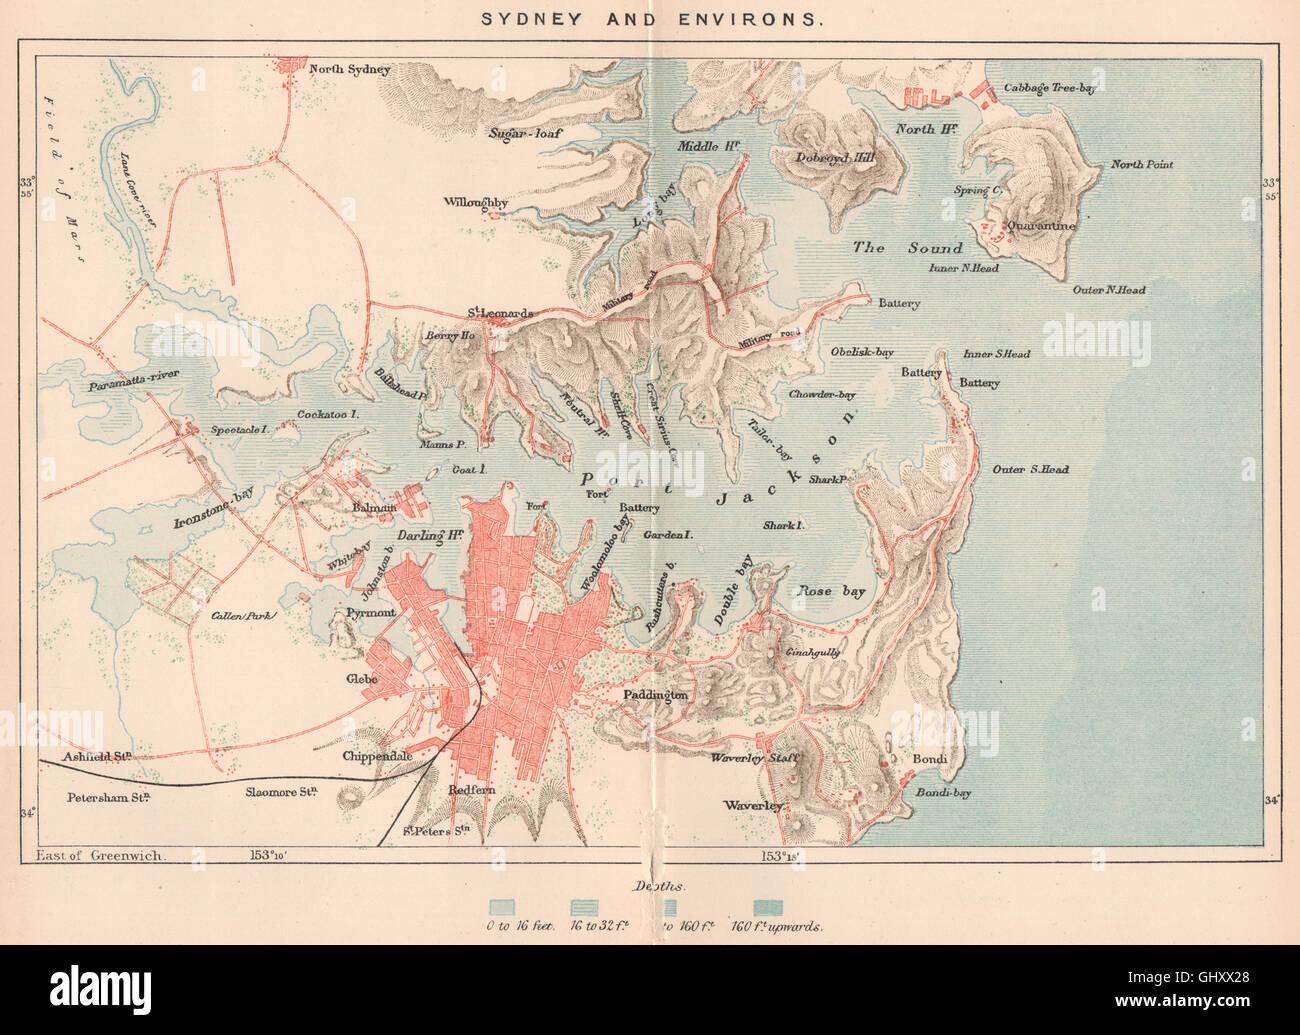 Karte Australien Und Umgebung.Map Australia And Tasmania Stockfotos Map Australia And